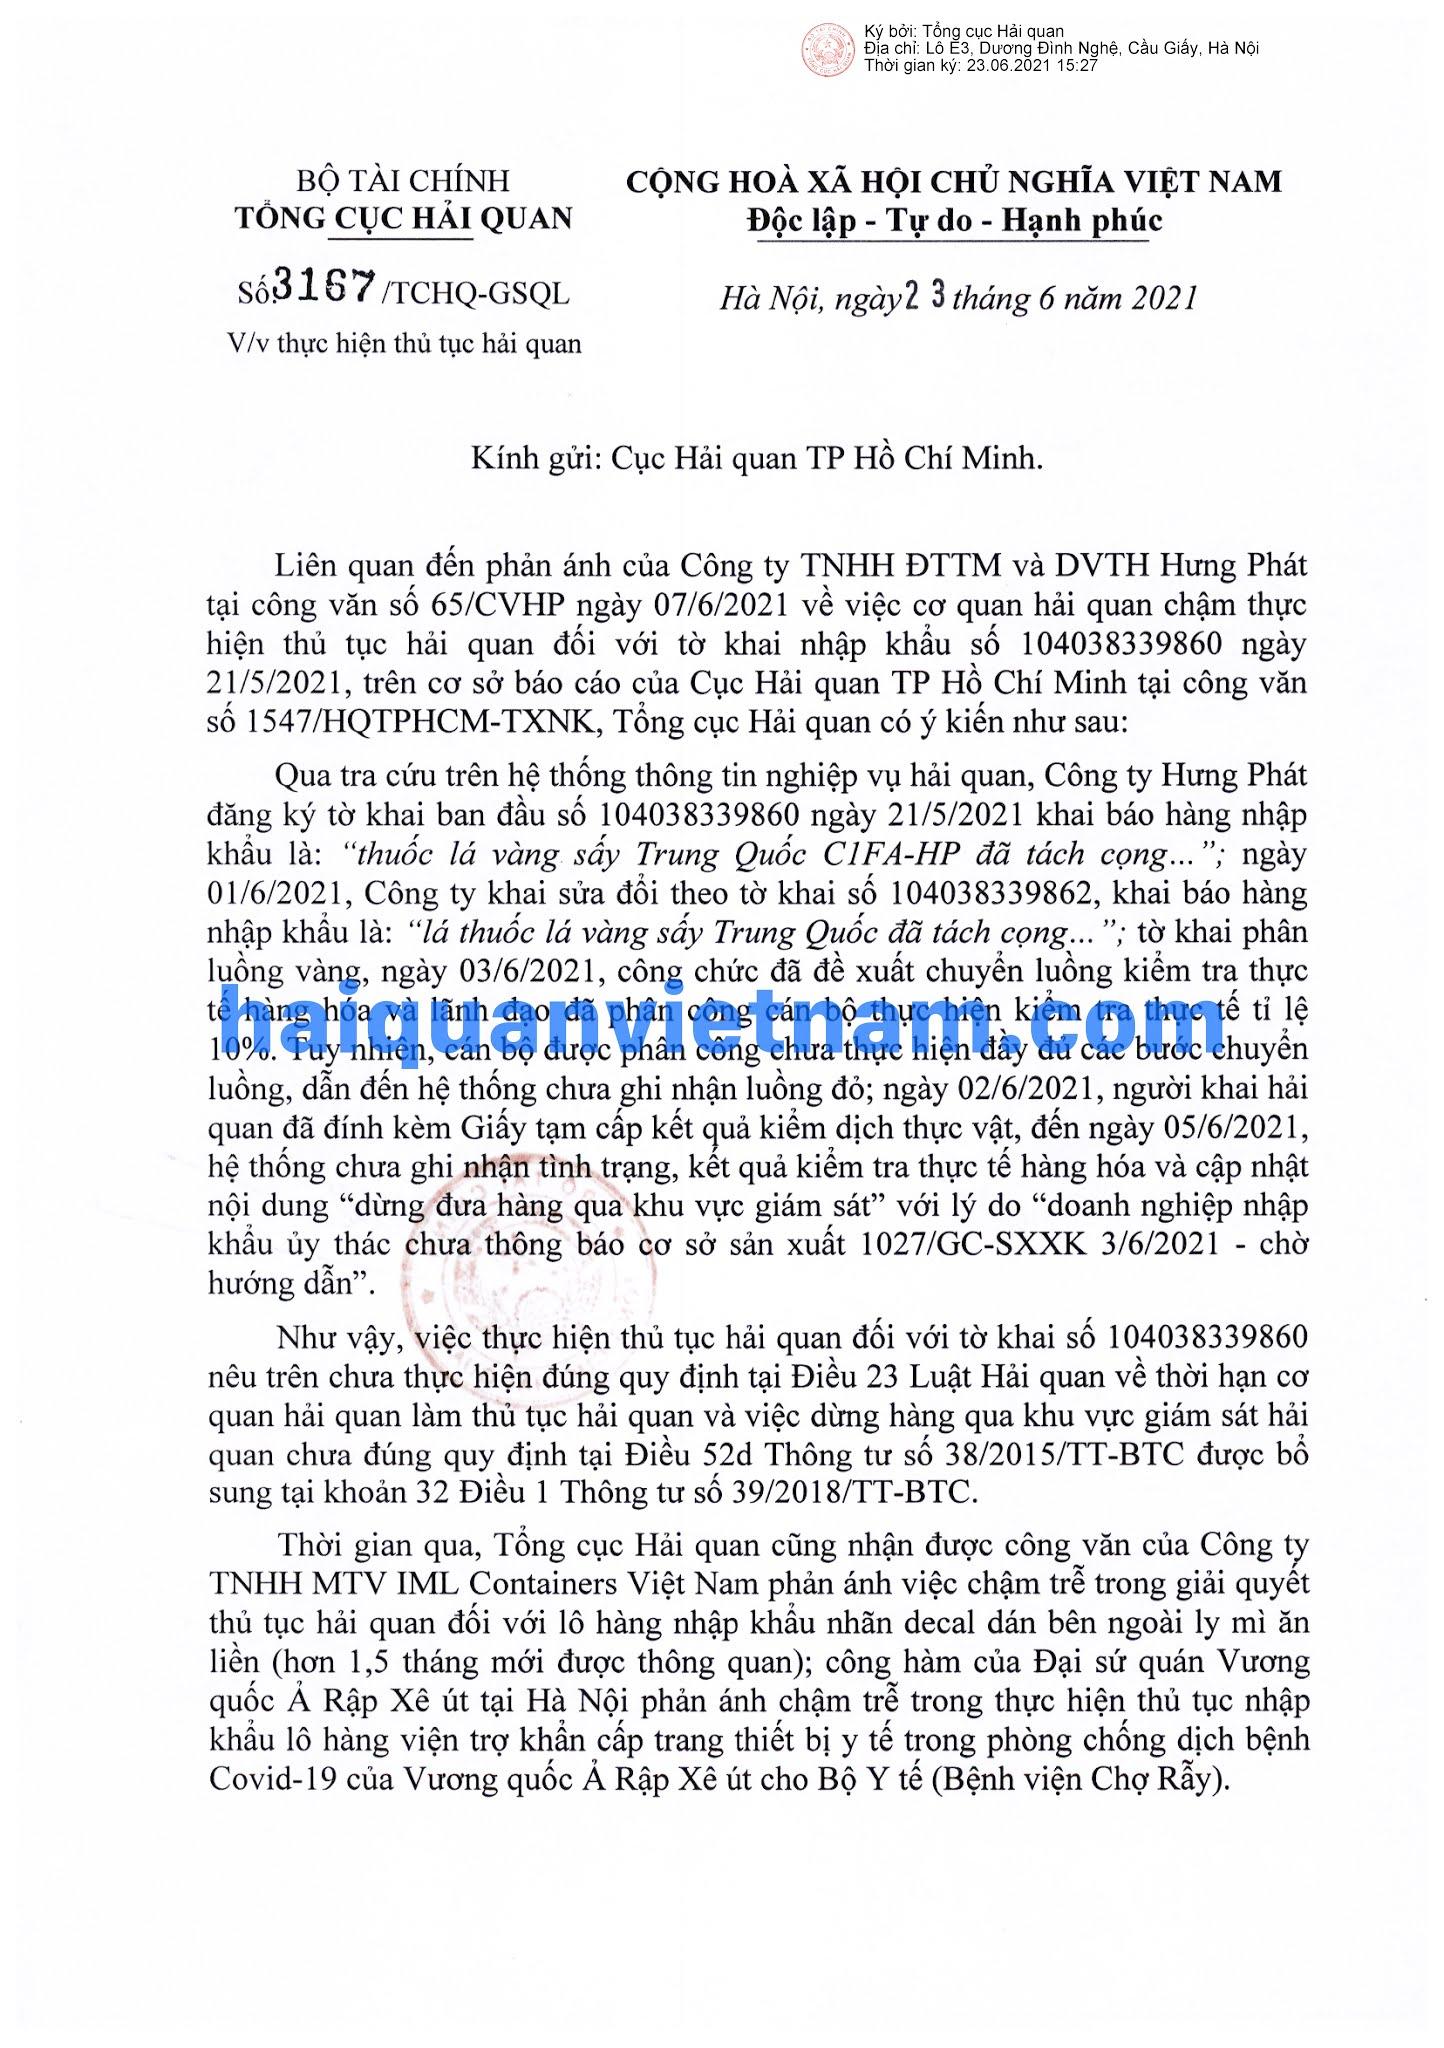 [Image: 210623_3167_TCHQ-GSQL_haiquanvietnam_01.jpg]